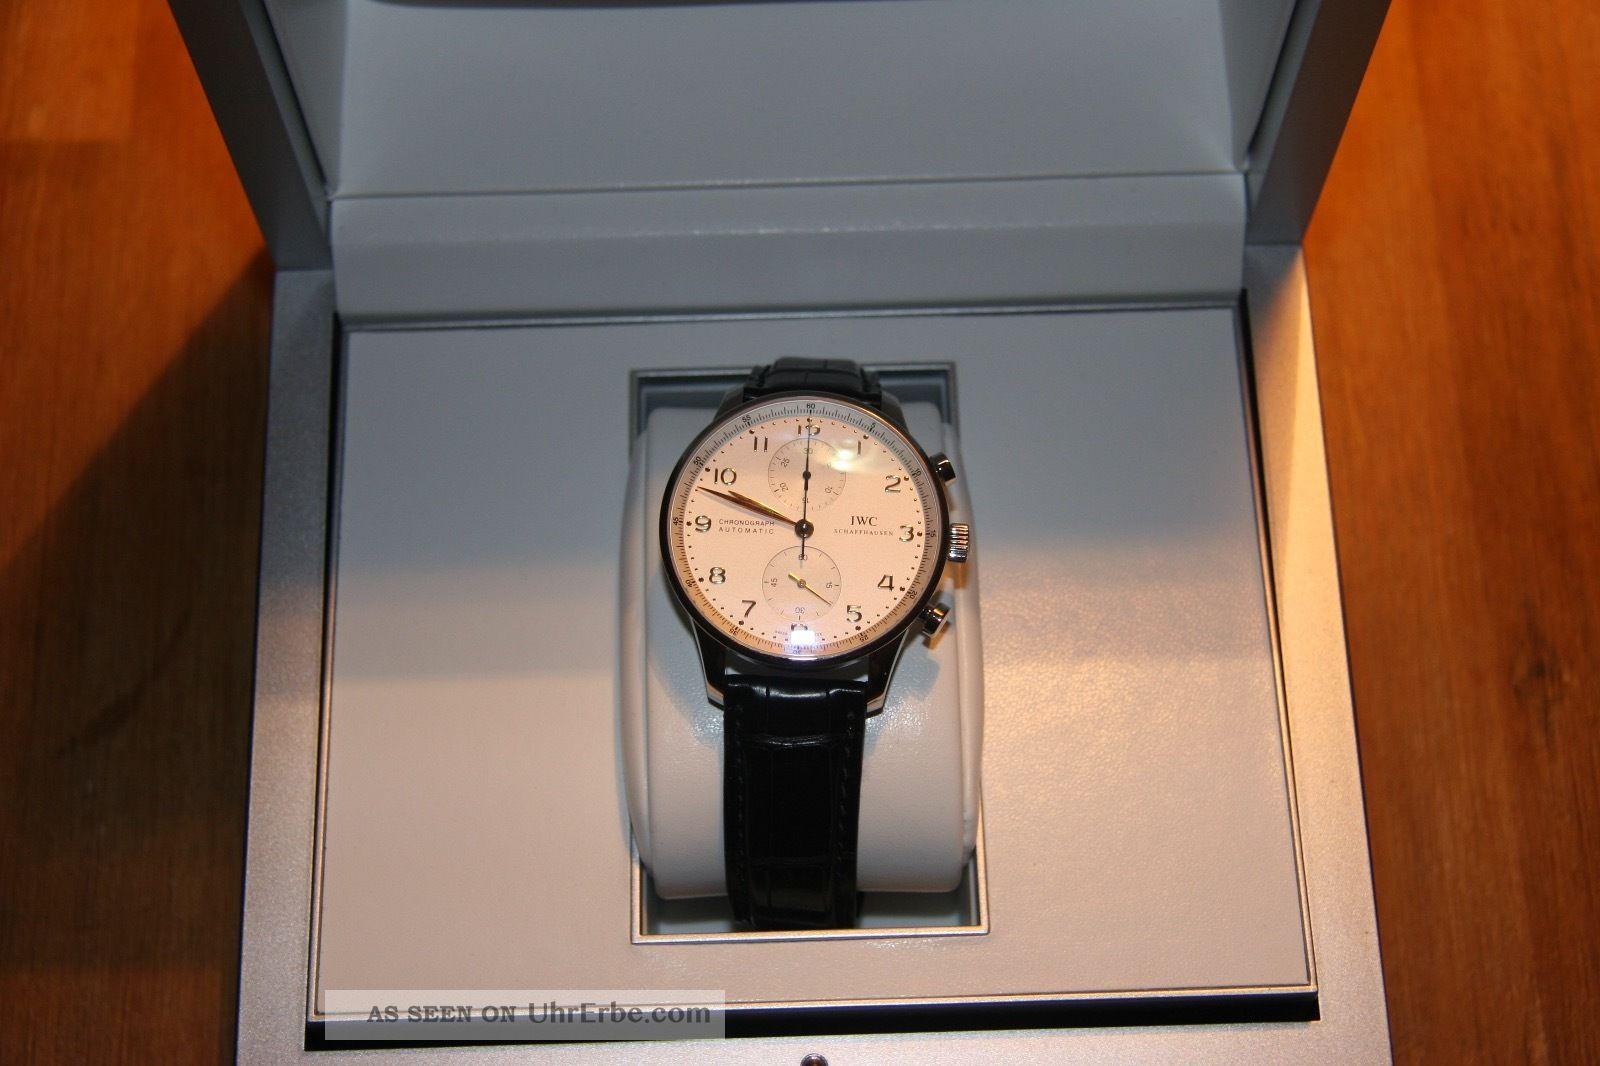 Iwc Portugieser Chronograph 3714, Armbanduhren Bild